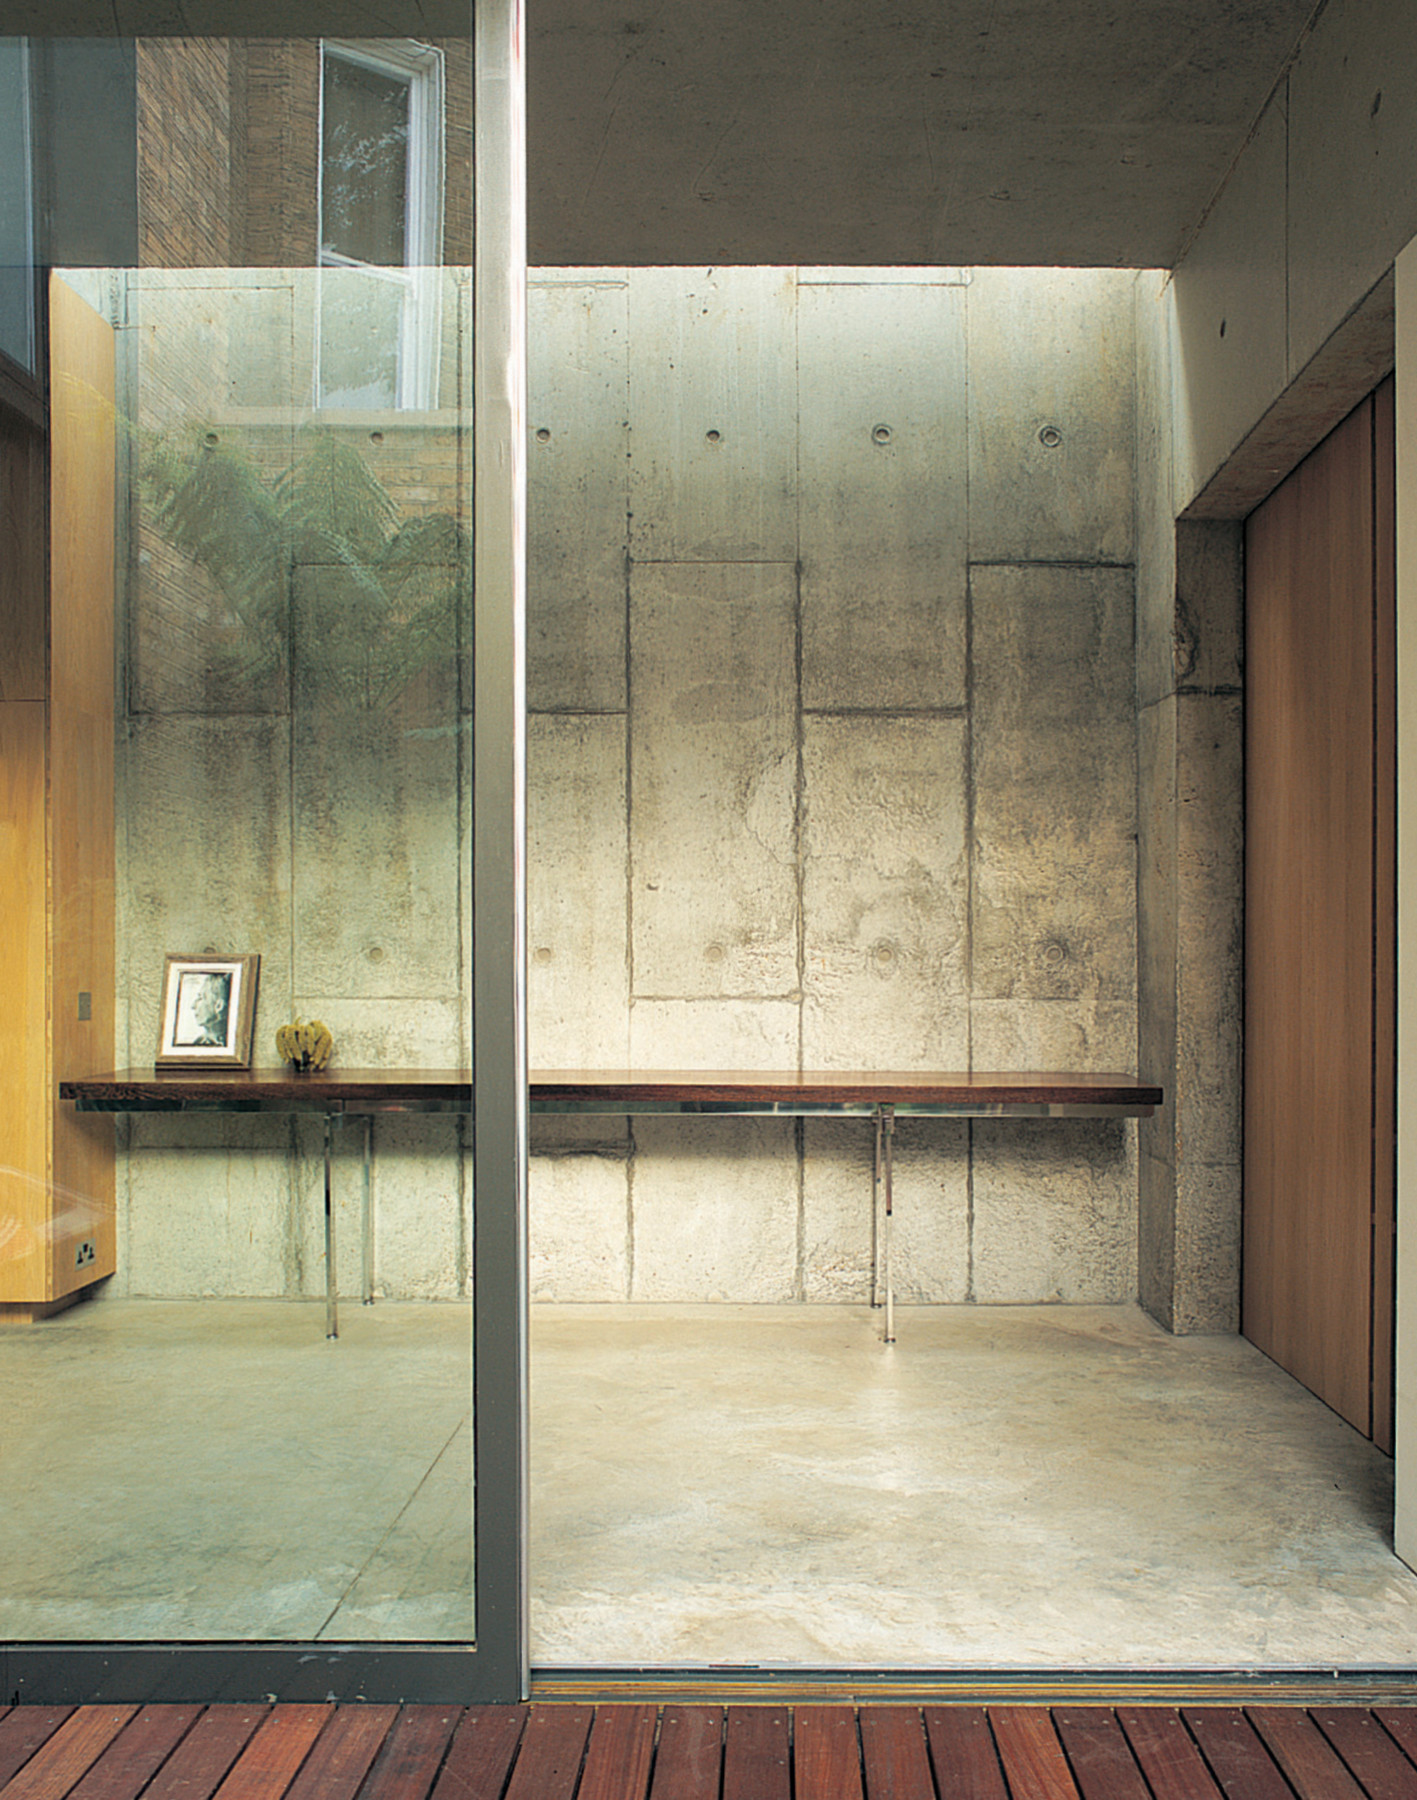 Kander-house-Primrose-hill-London-residential-home-contemporary-interior-Riba-award-victorian-Jamie-Fobert-Architects